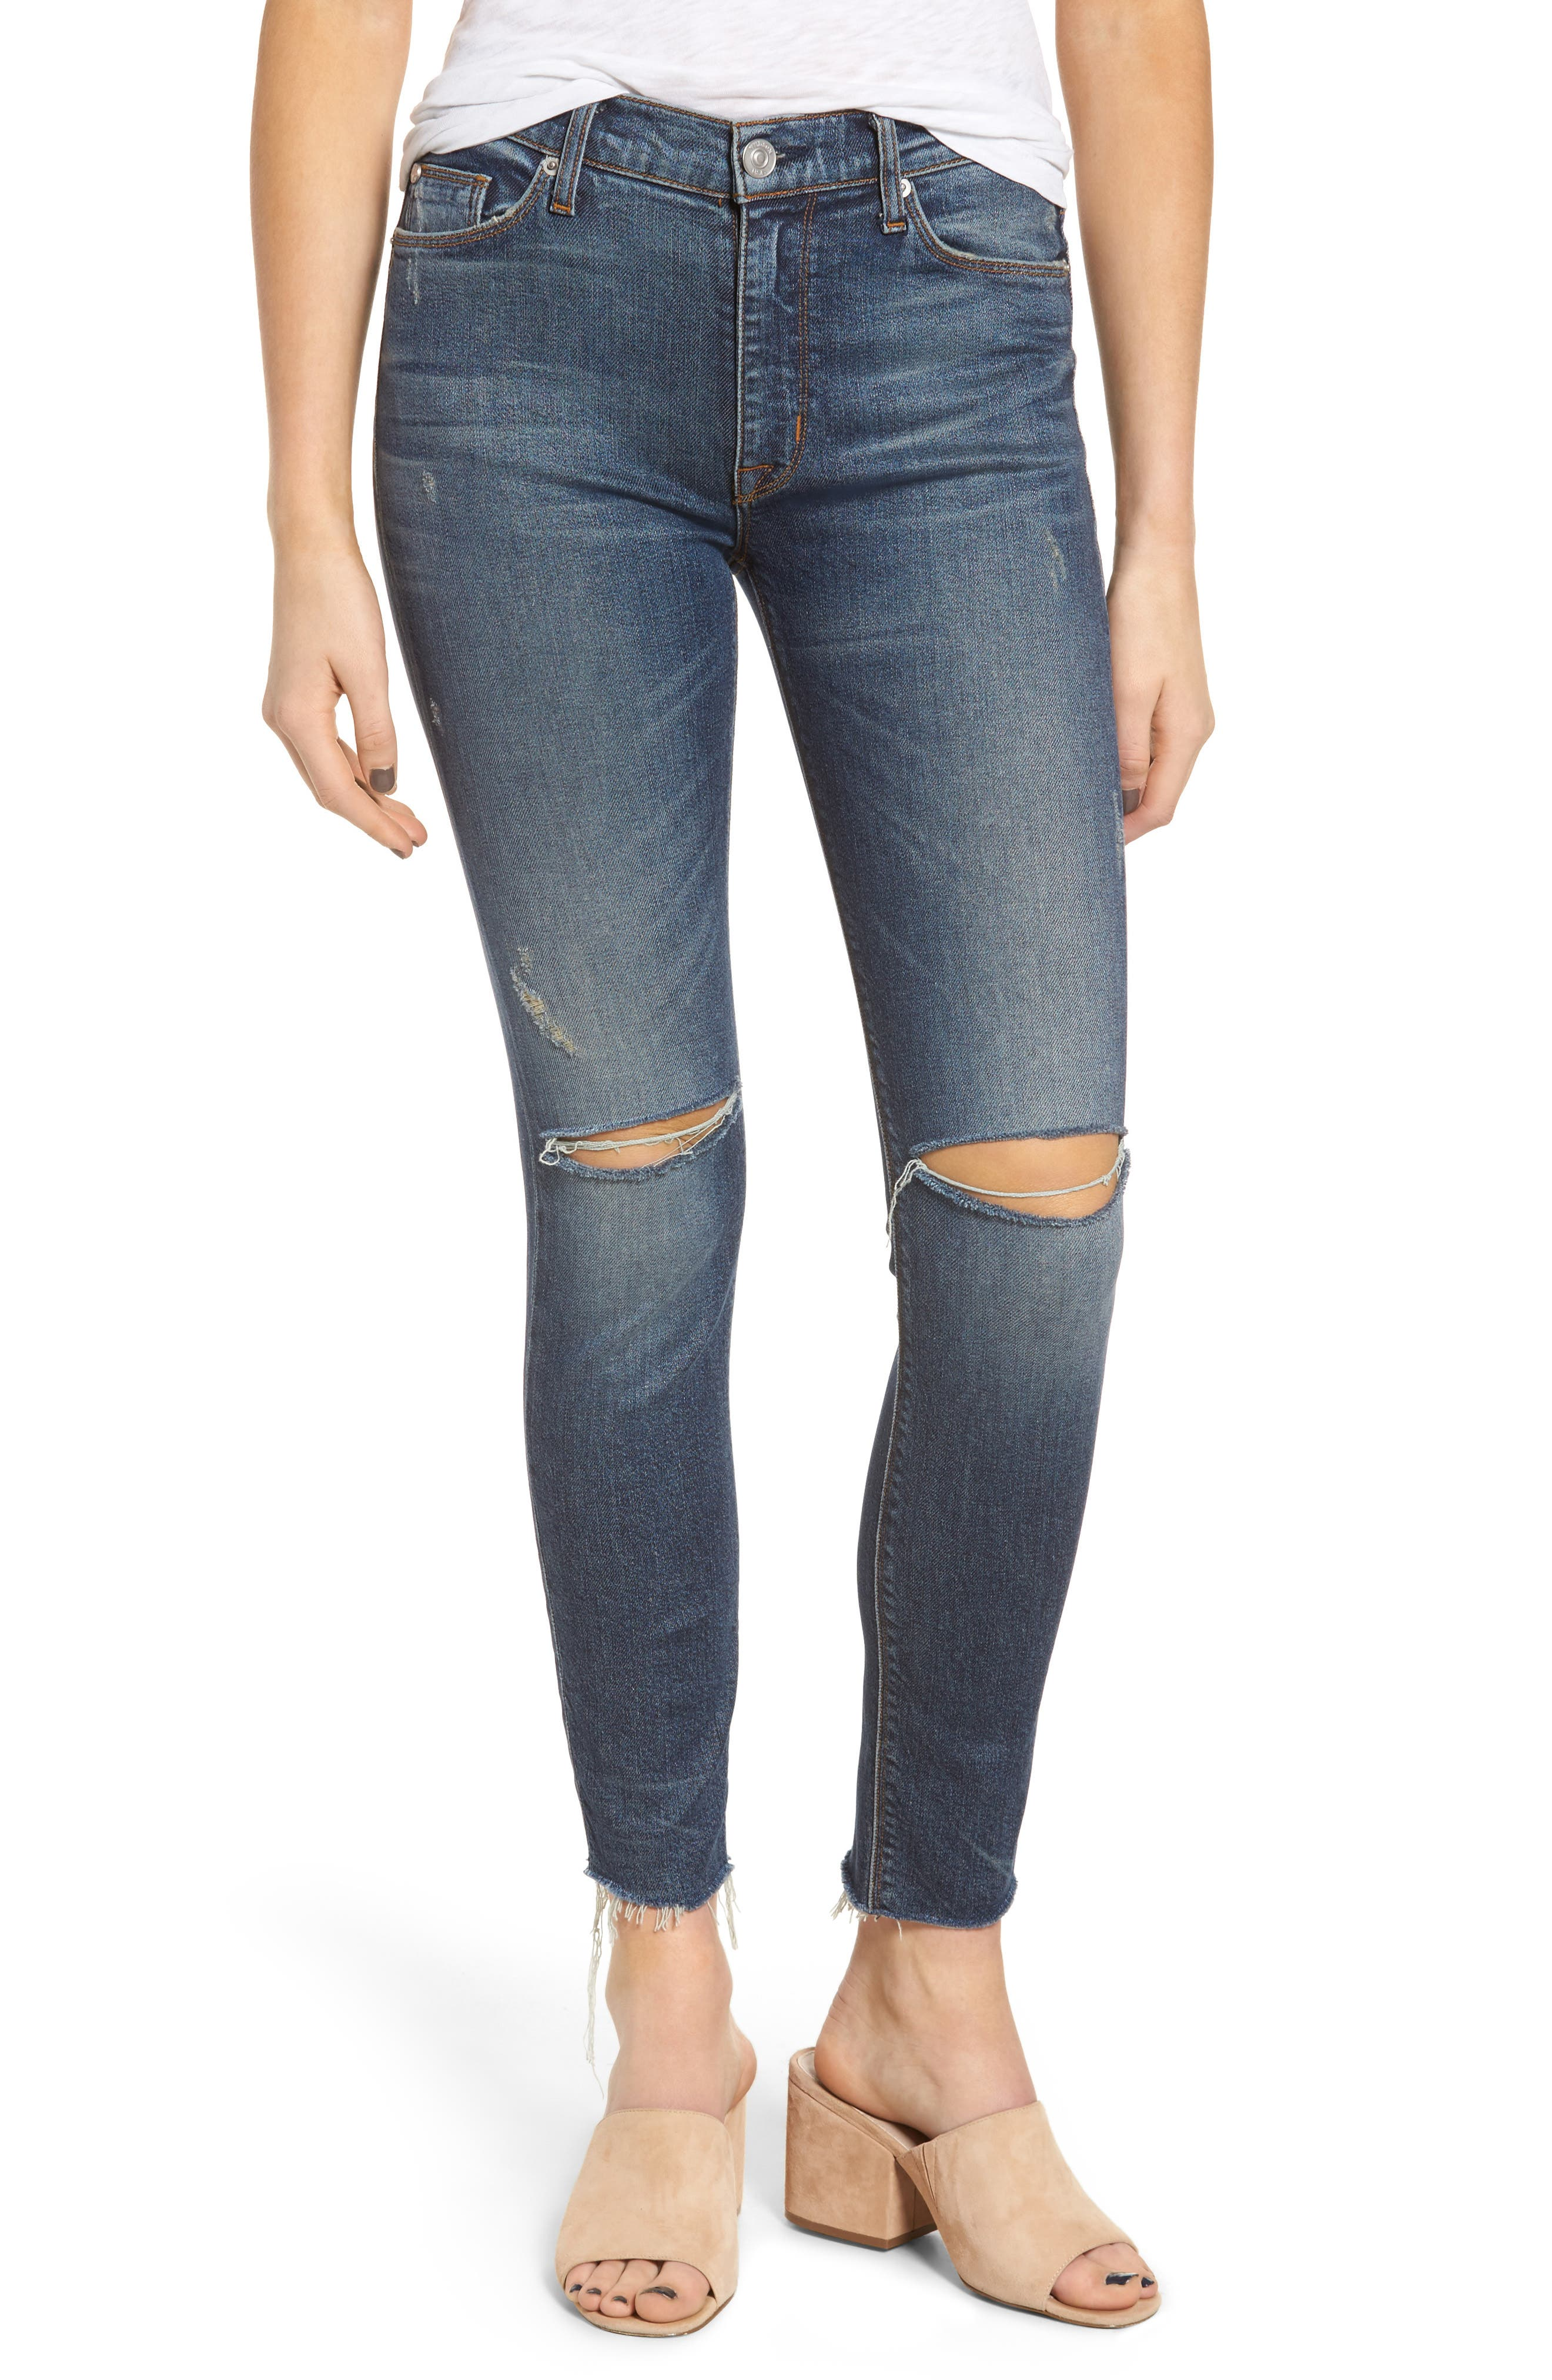 Barbara High Waist Skinny Jeans,                             Main thumbnail 1, color,                             429